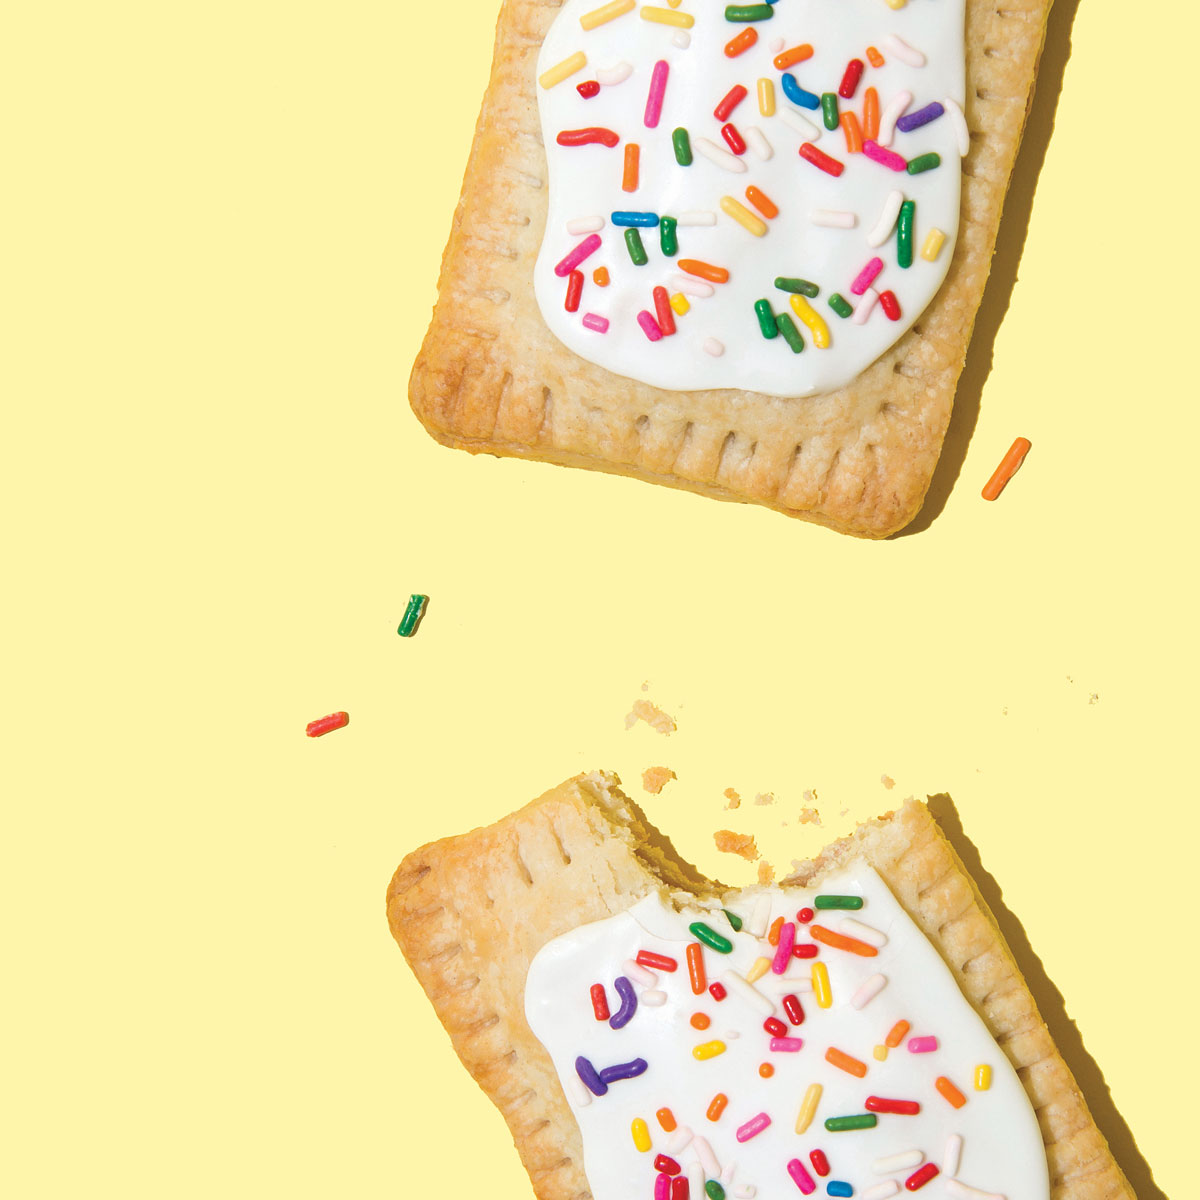 Ashley Sue's Baked Goods' Strawberry Pop Tarts